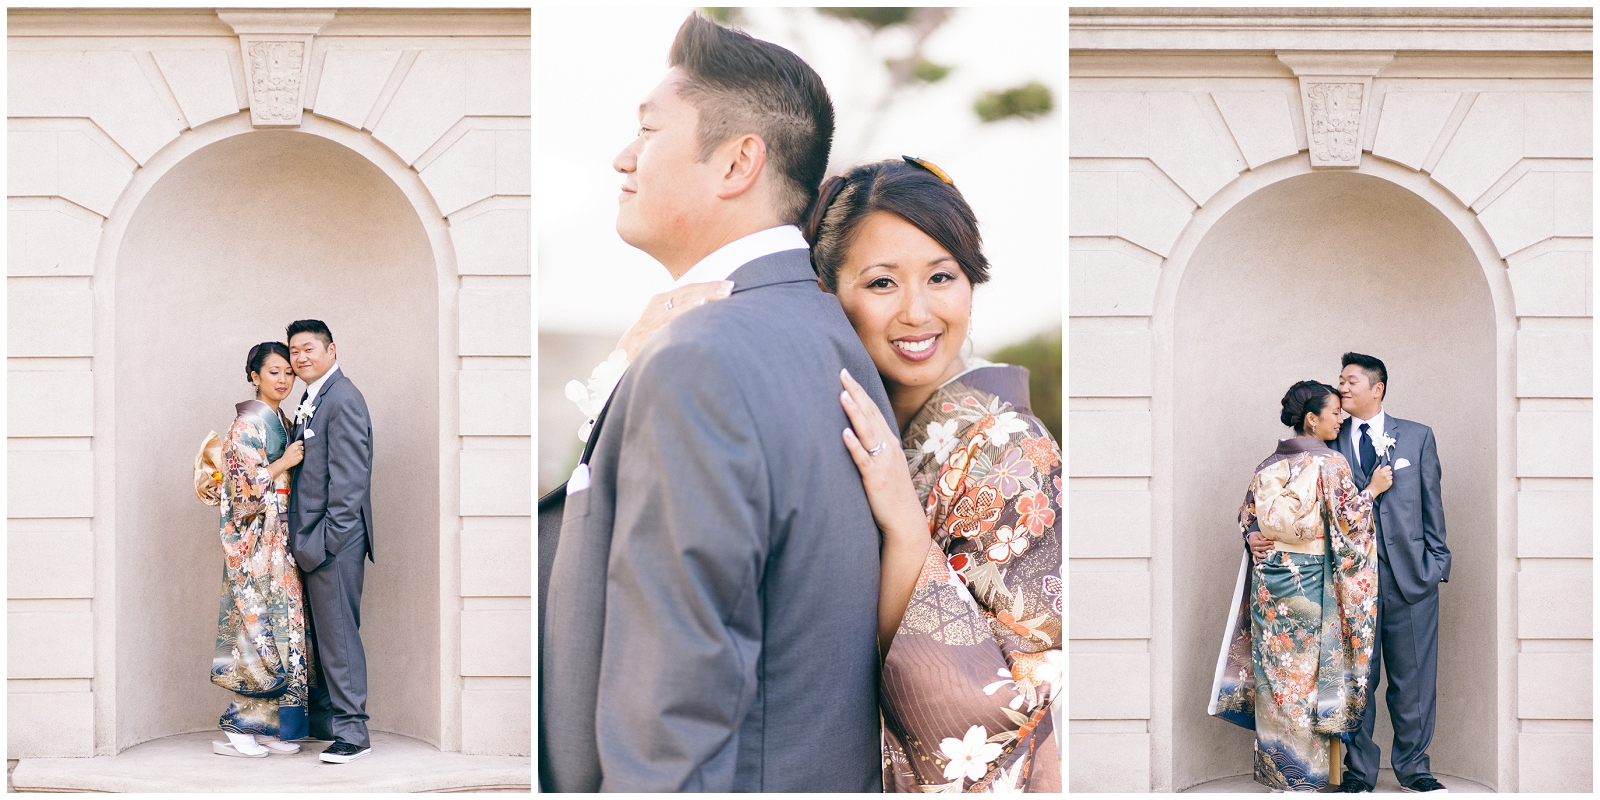 San-Francisco-Bay-Area-Wedding-Photography-Cultural-11.jpg